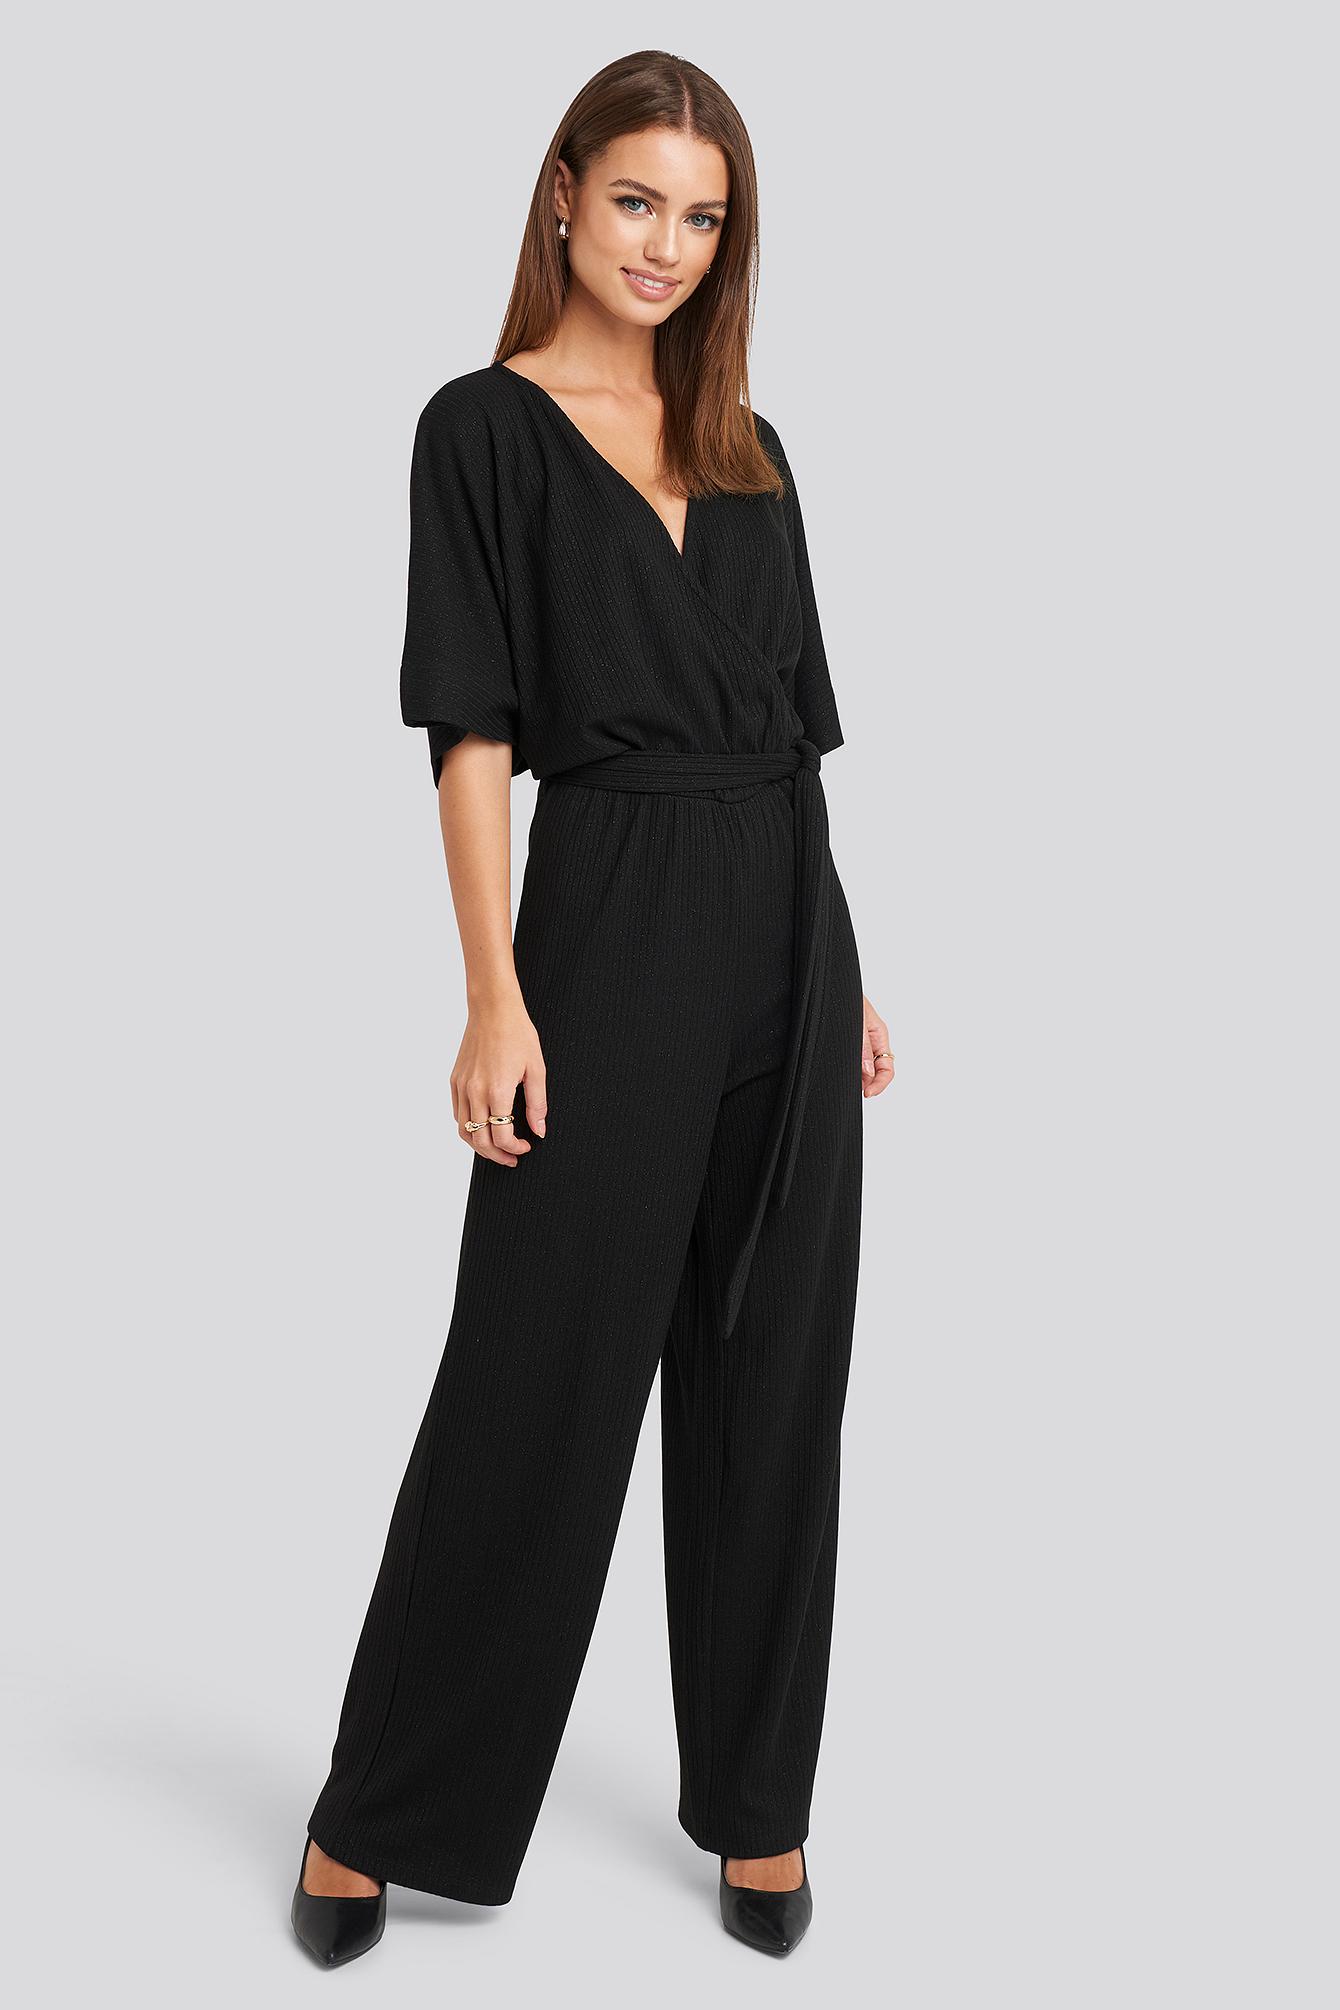 NA-KD Party Kimono Sleeve Lurex Jumpsuit - Black | Bekleidung > Homewear | NA-KD Party